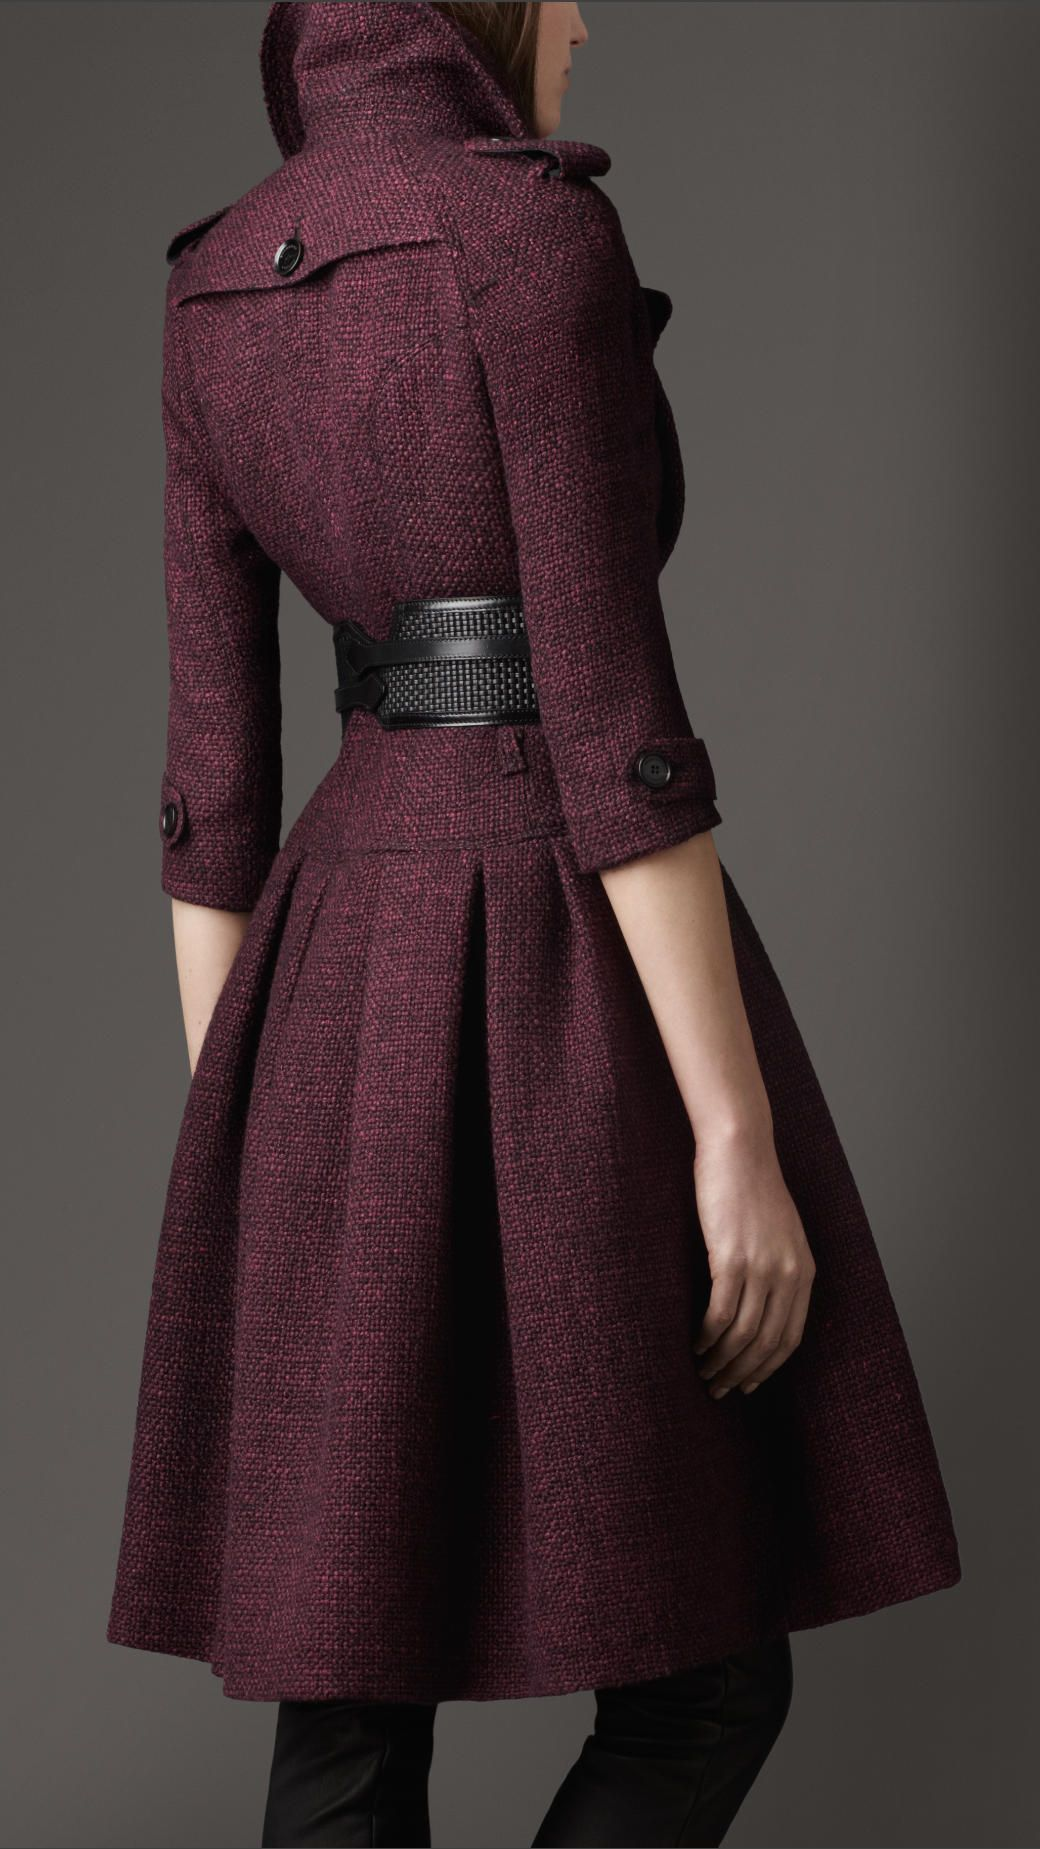 Burberry Full Skirted Tweed Coat in Purple (elderberry)   Lyst ... d4d8708b448